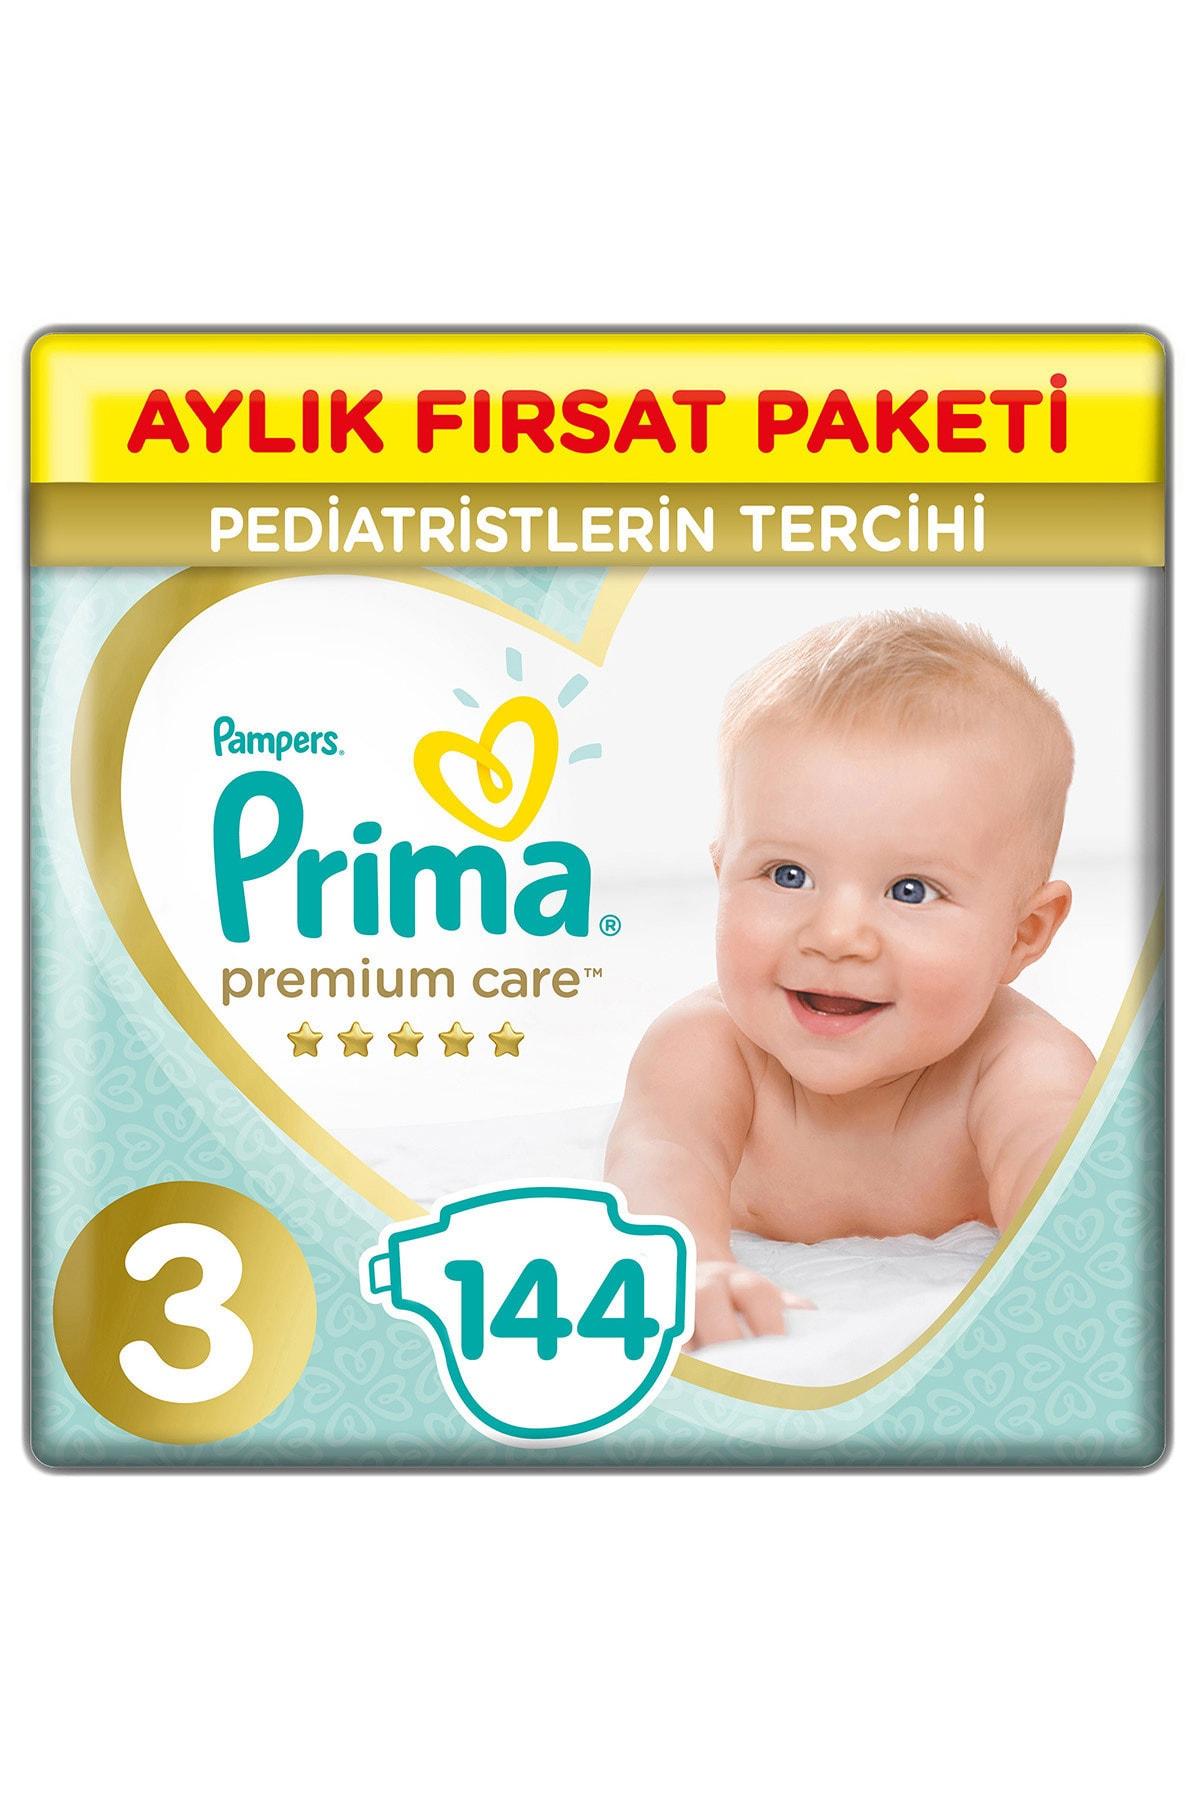 Prima Bebek Bezi Premium Care 3 Beden 144 Adet Midi Aylık Fırsat Paketi 1